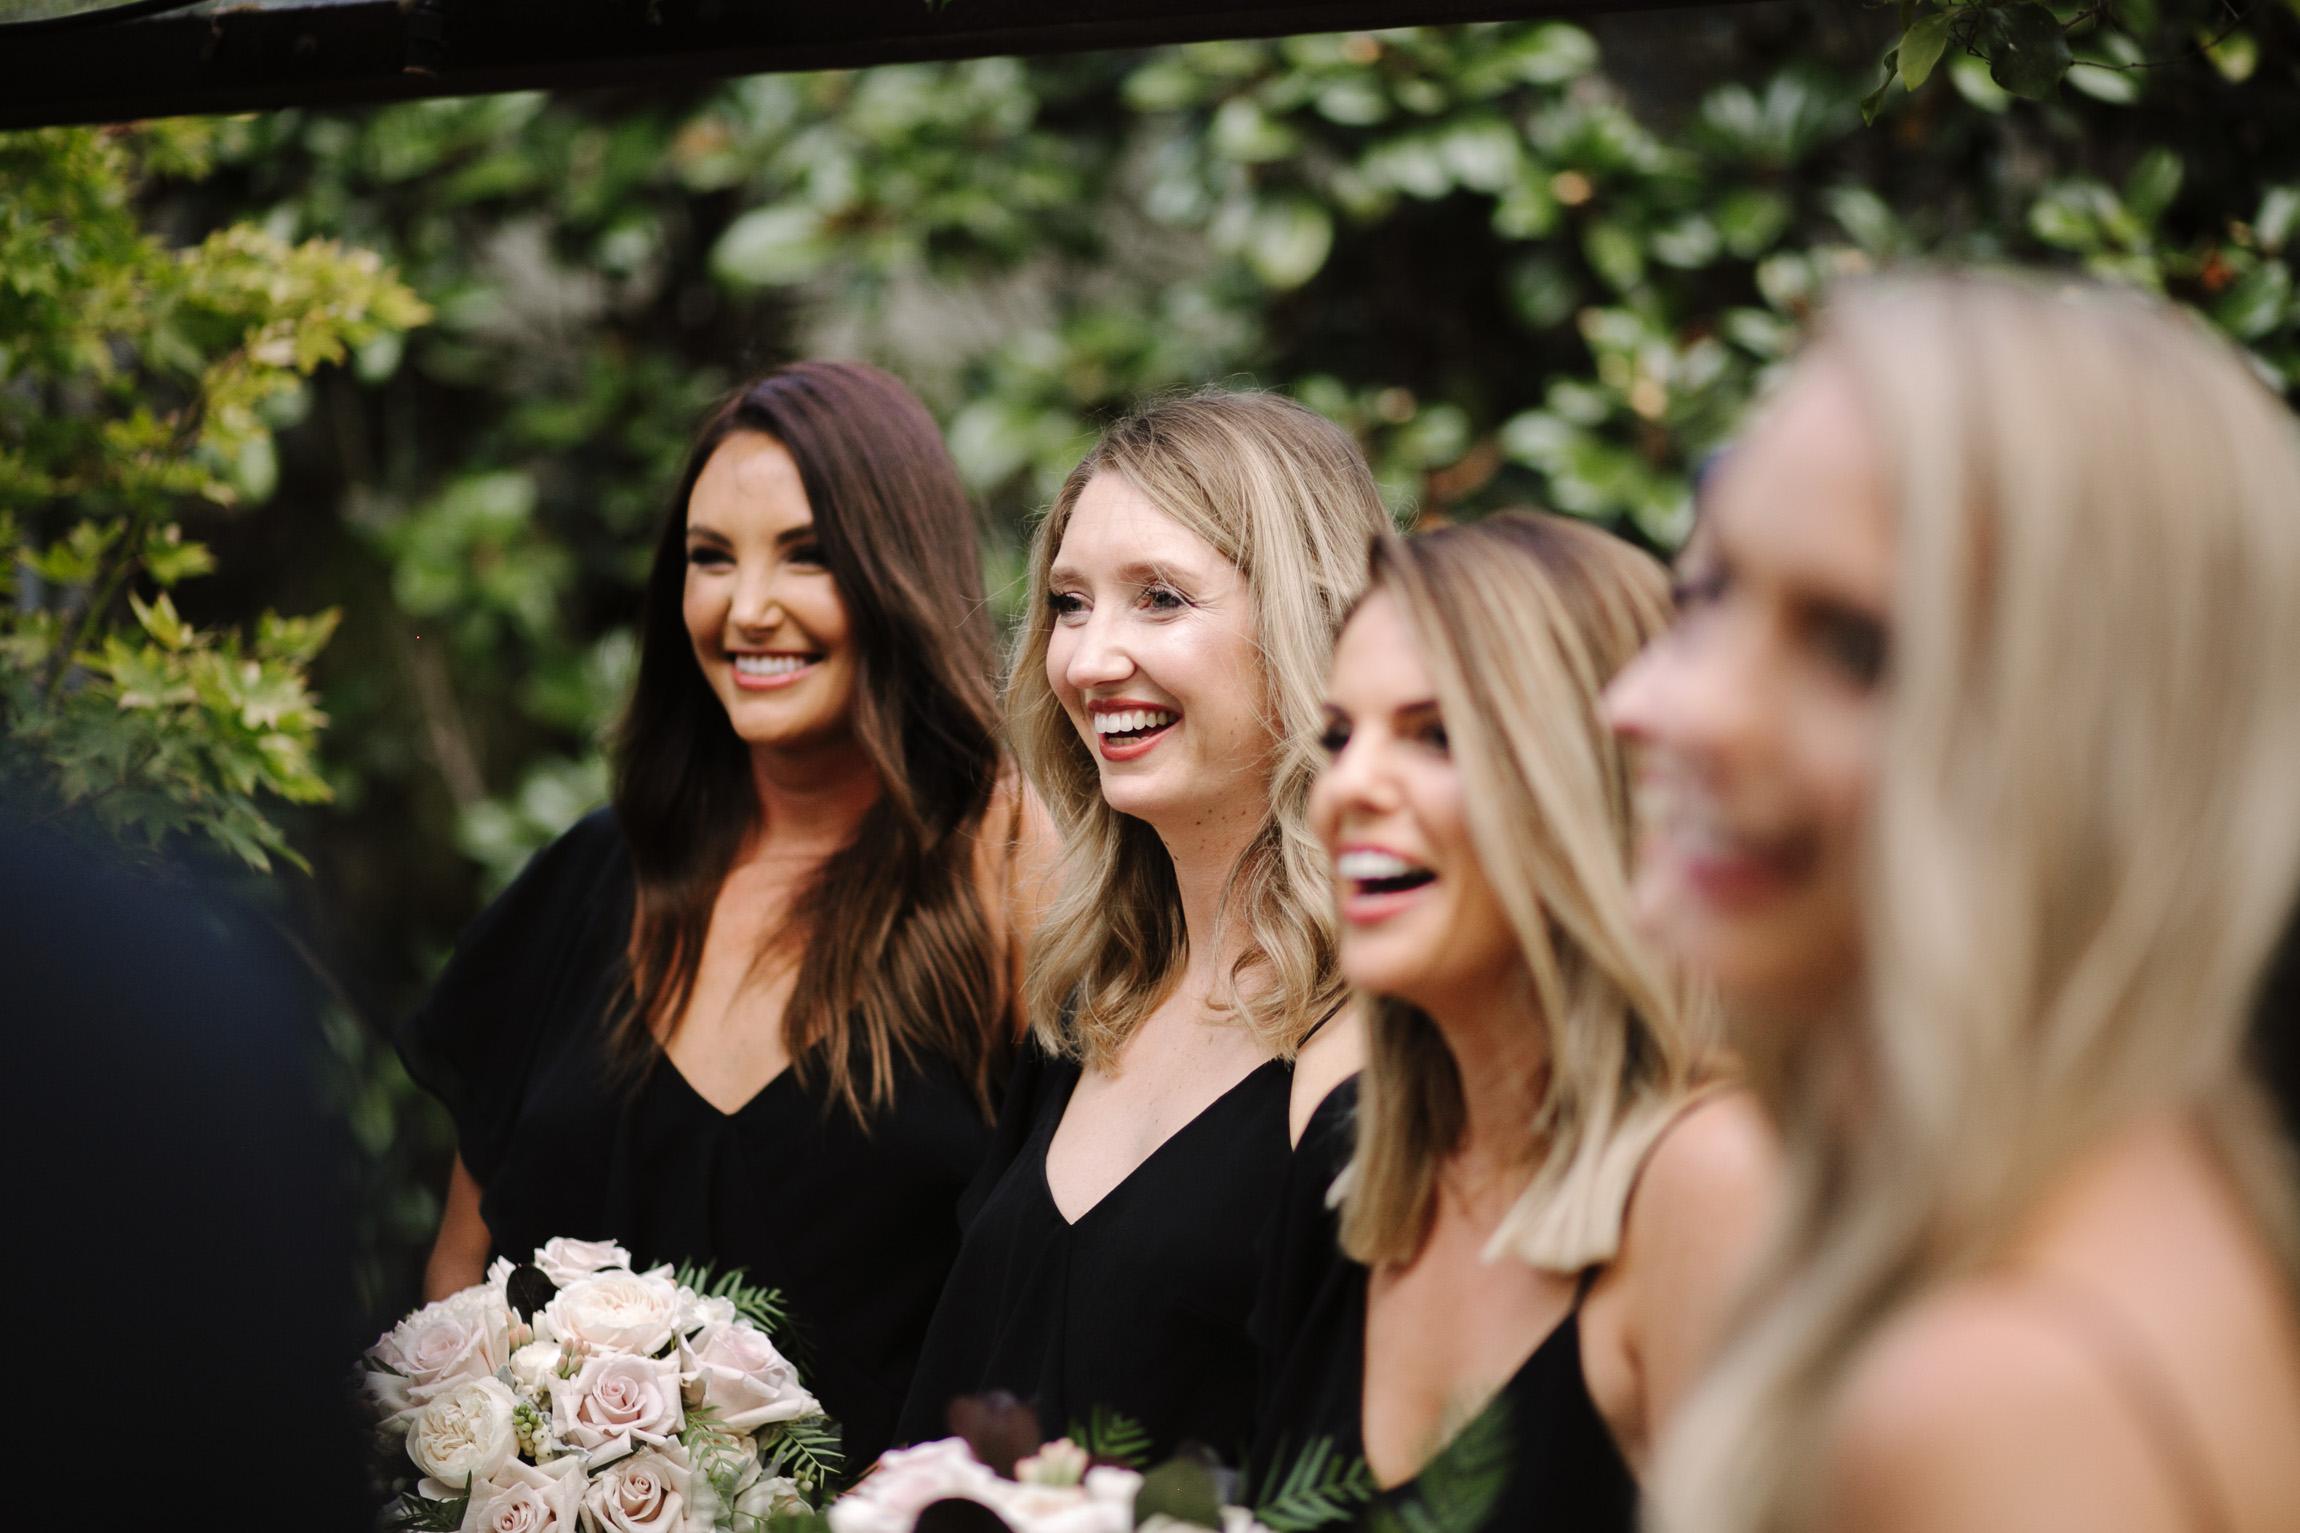 180223_justinaaron_wedding_charlotte_david_h-122.jpg